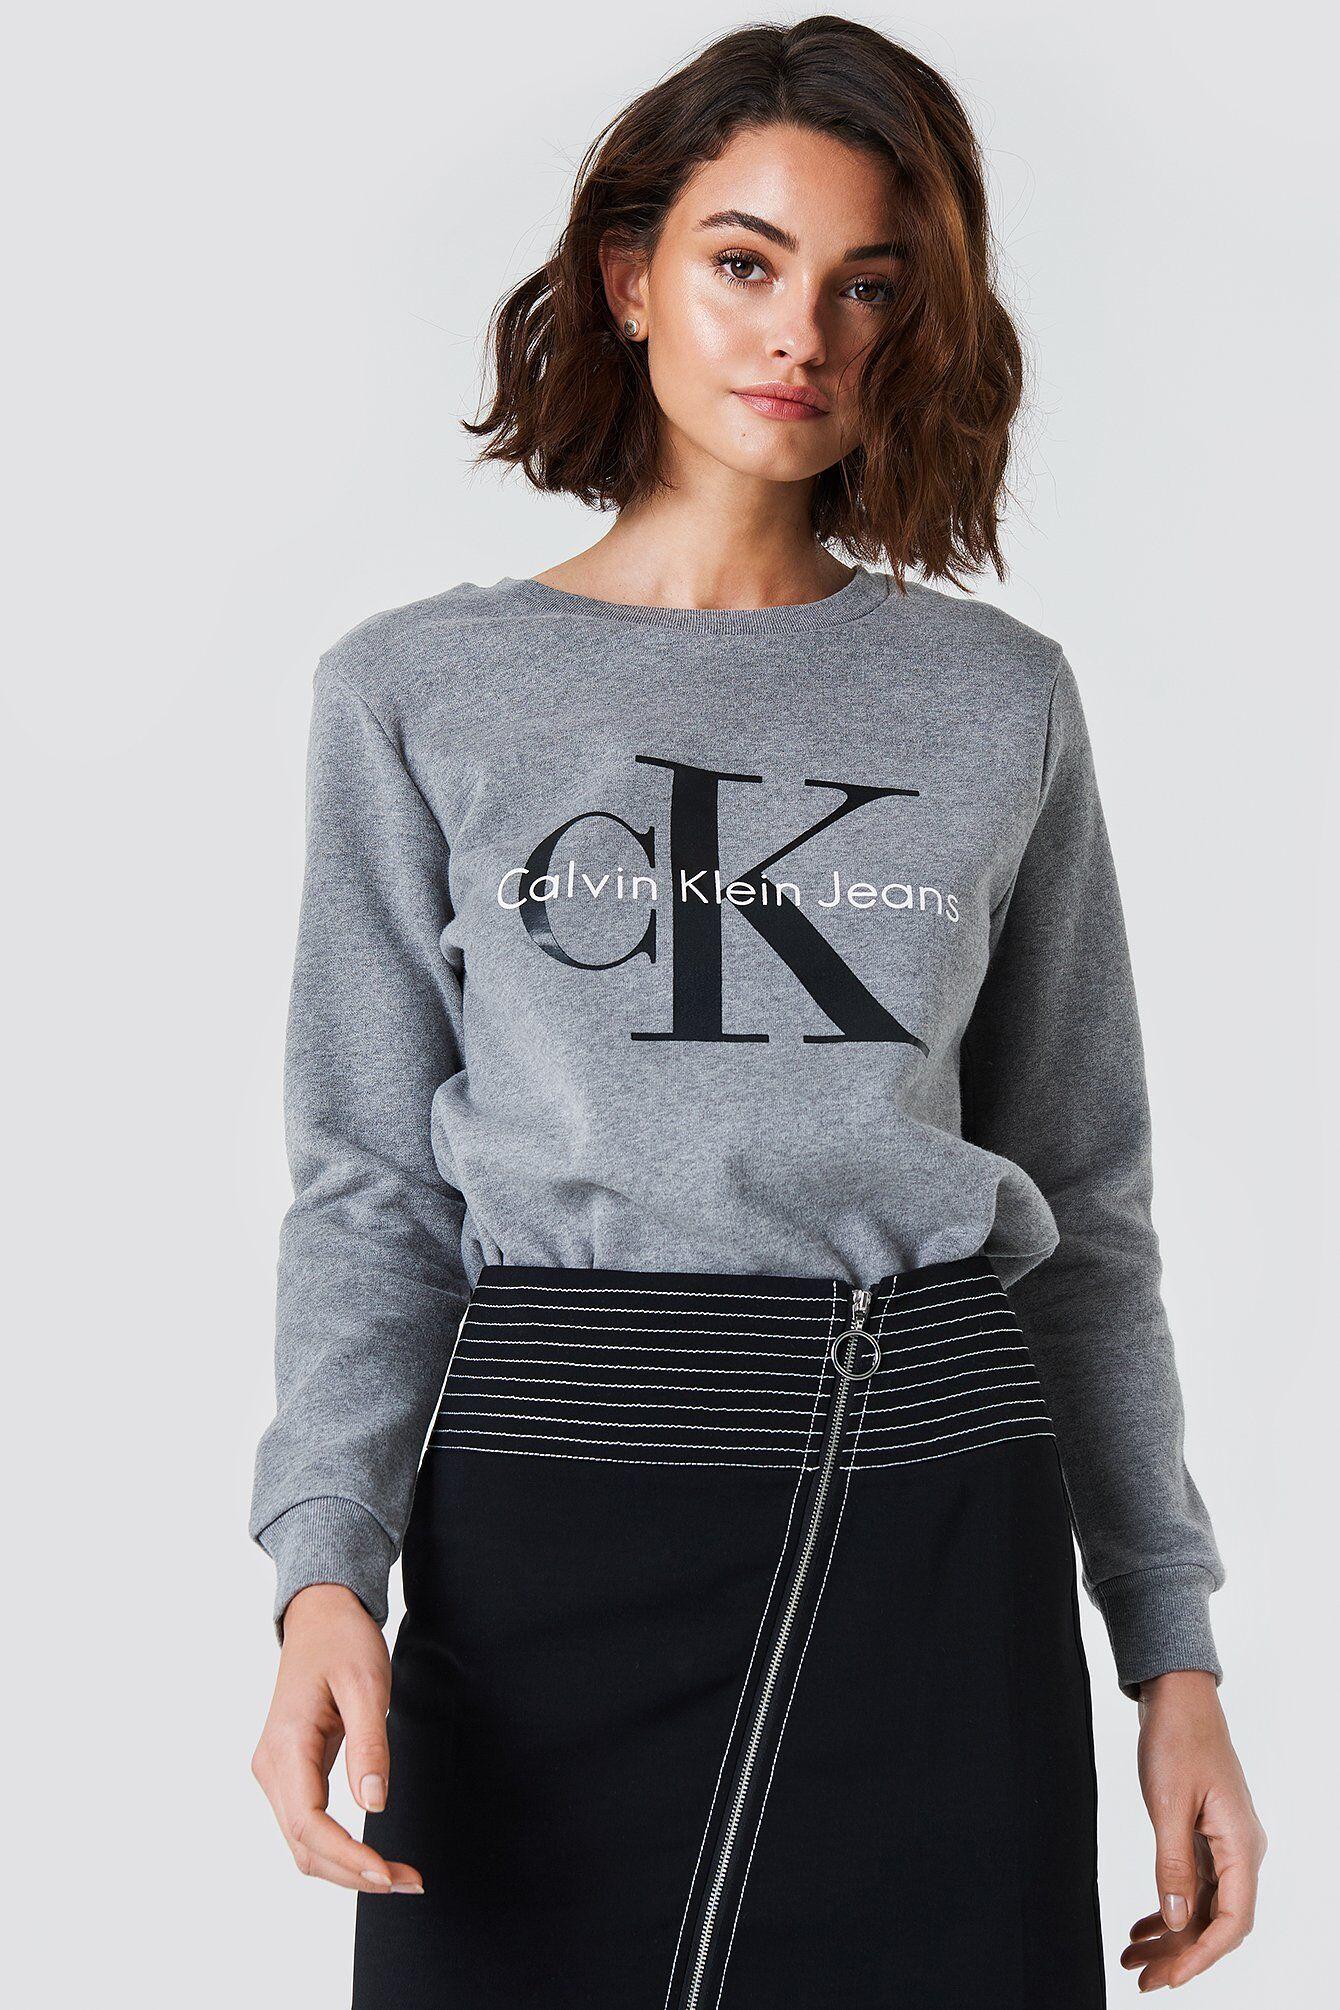 Image of Calvin Klein Crew Neck True Icon Sweatshirt - Grey  - Size: Small